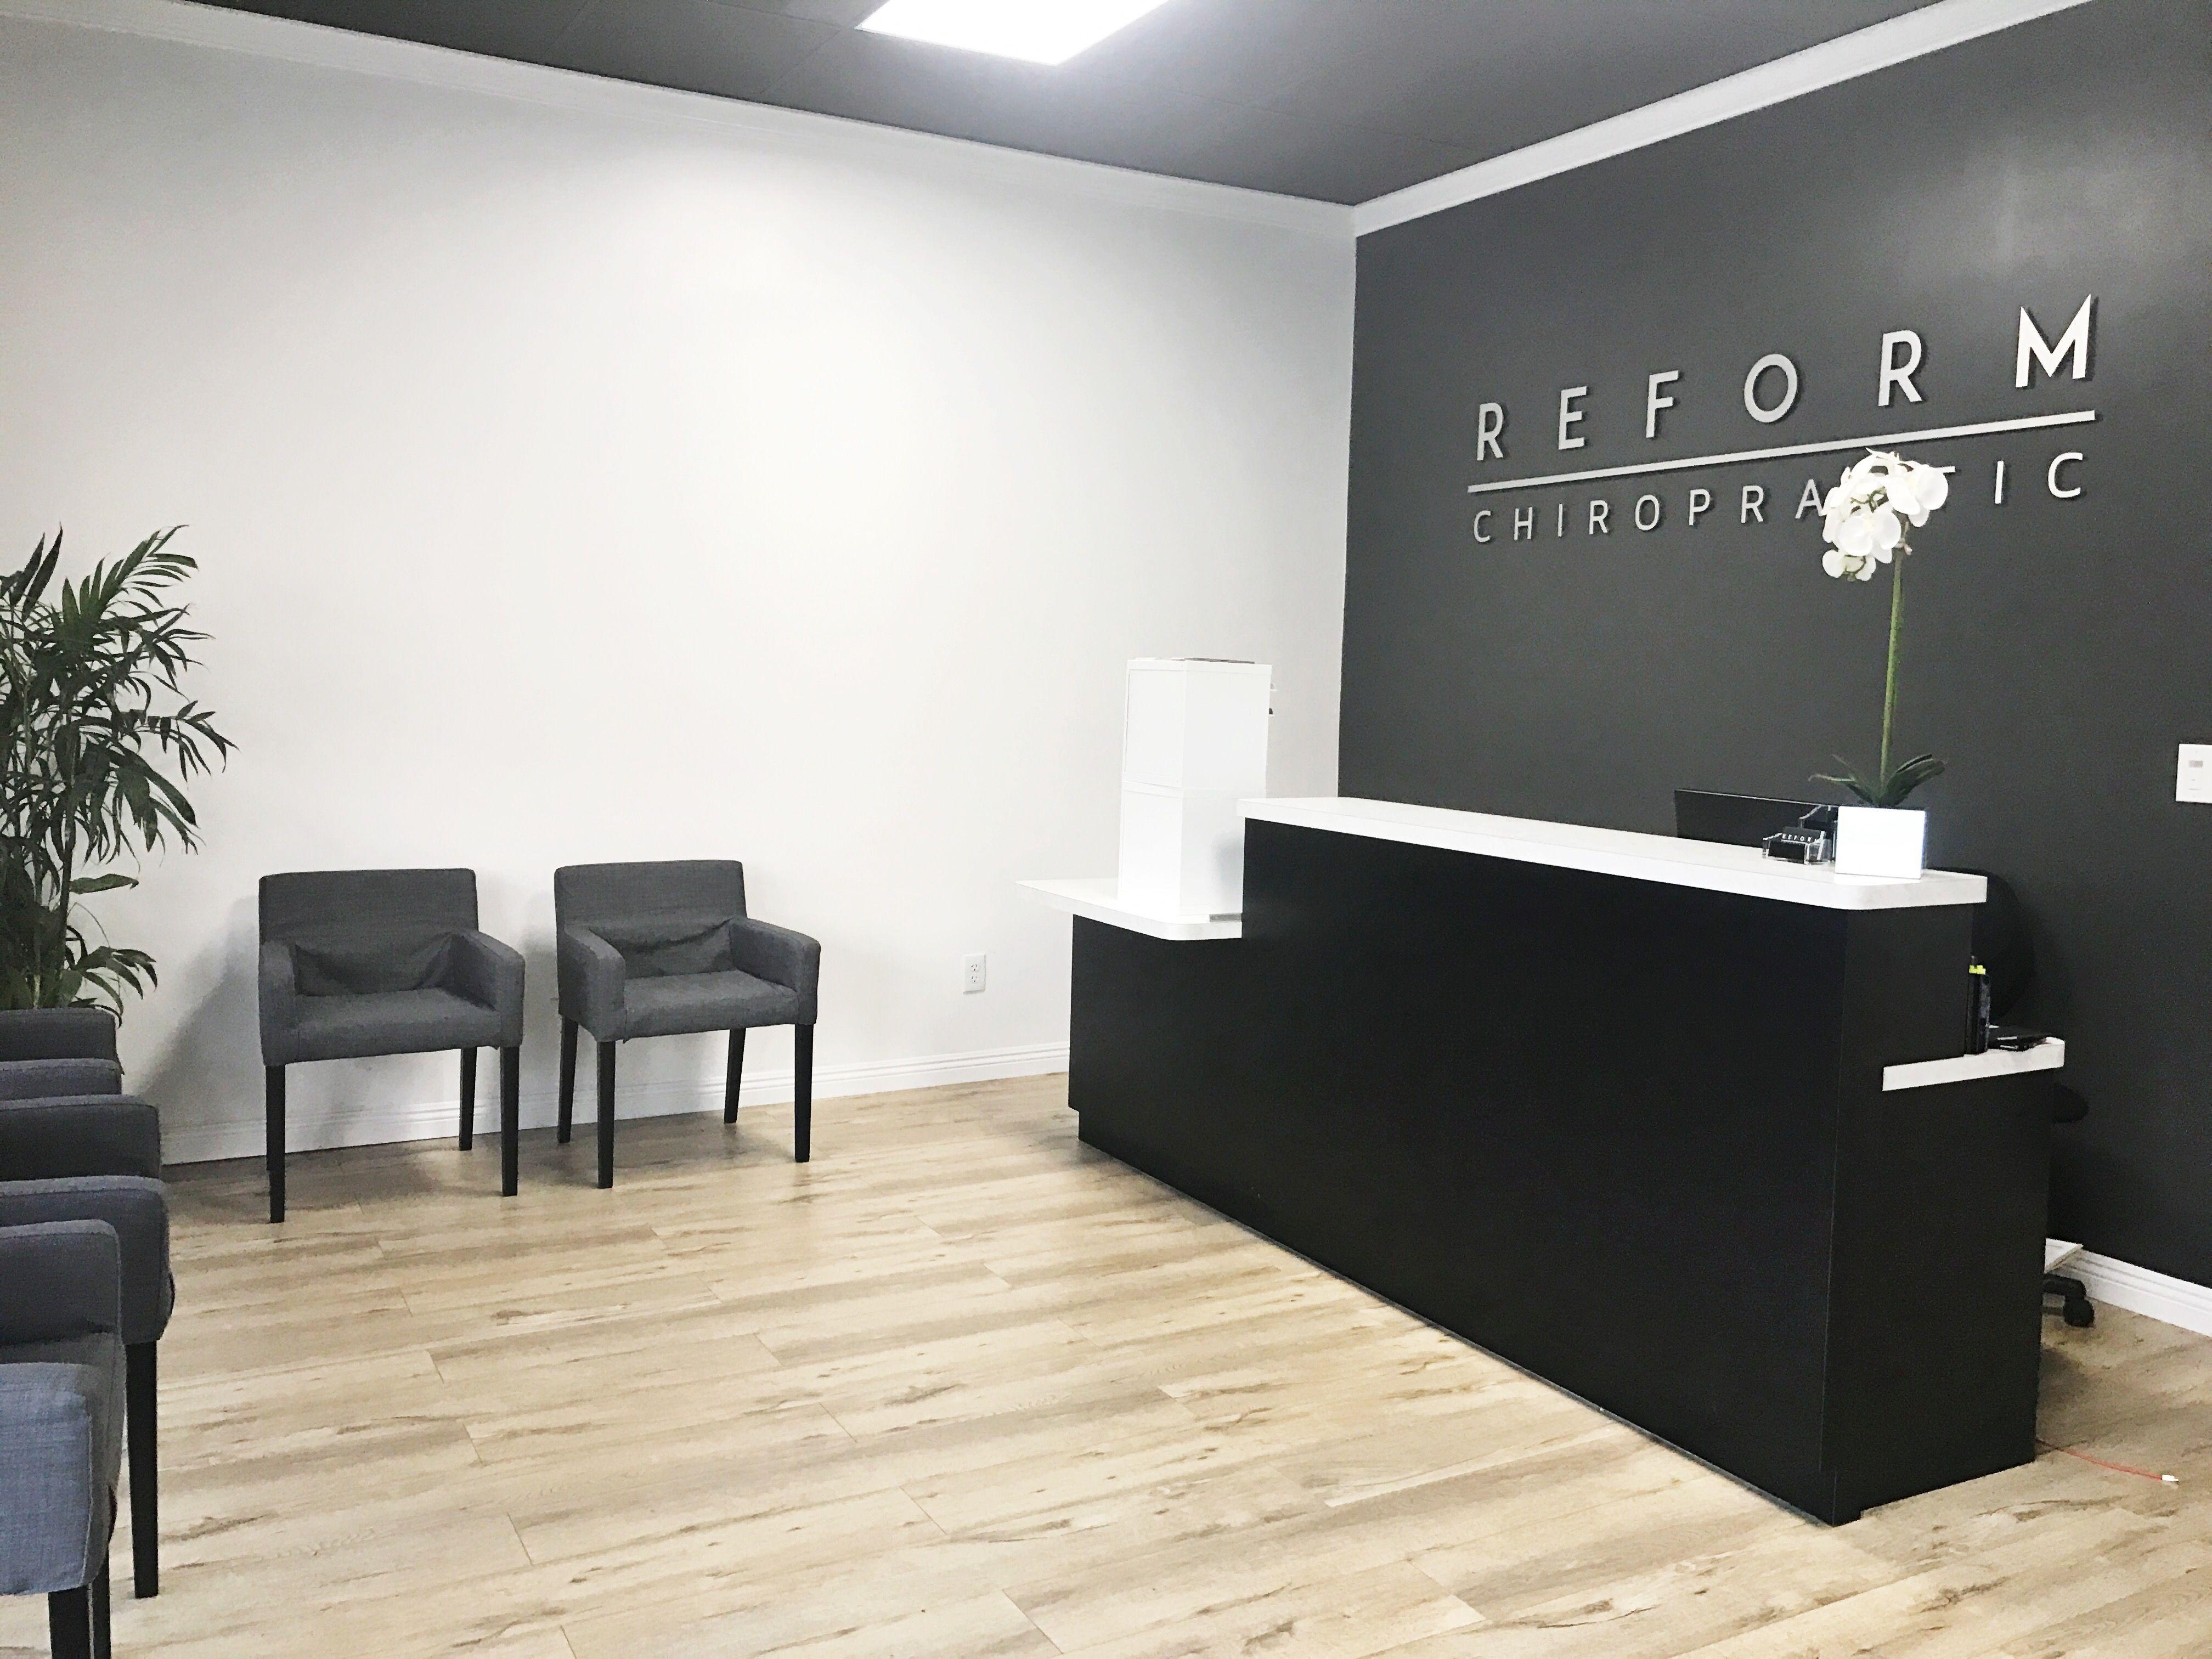 Chiropractic fice Lobby Reception Modern Design